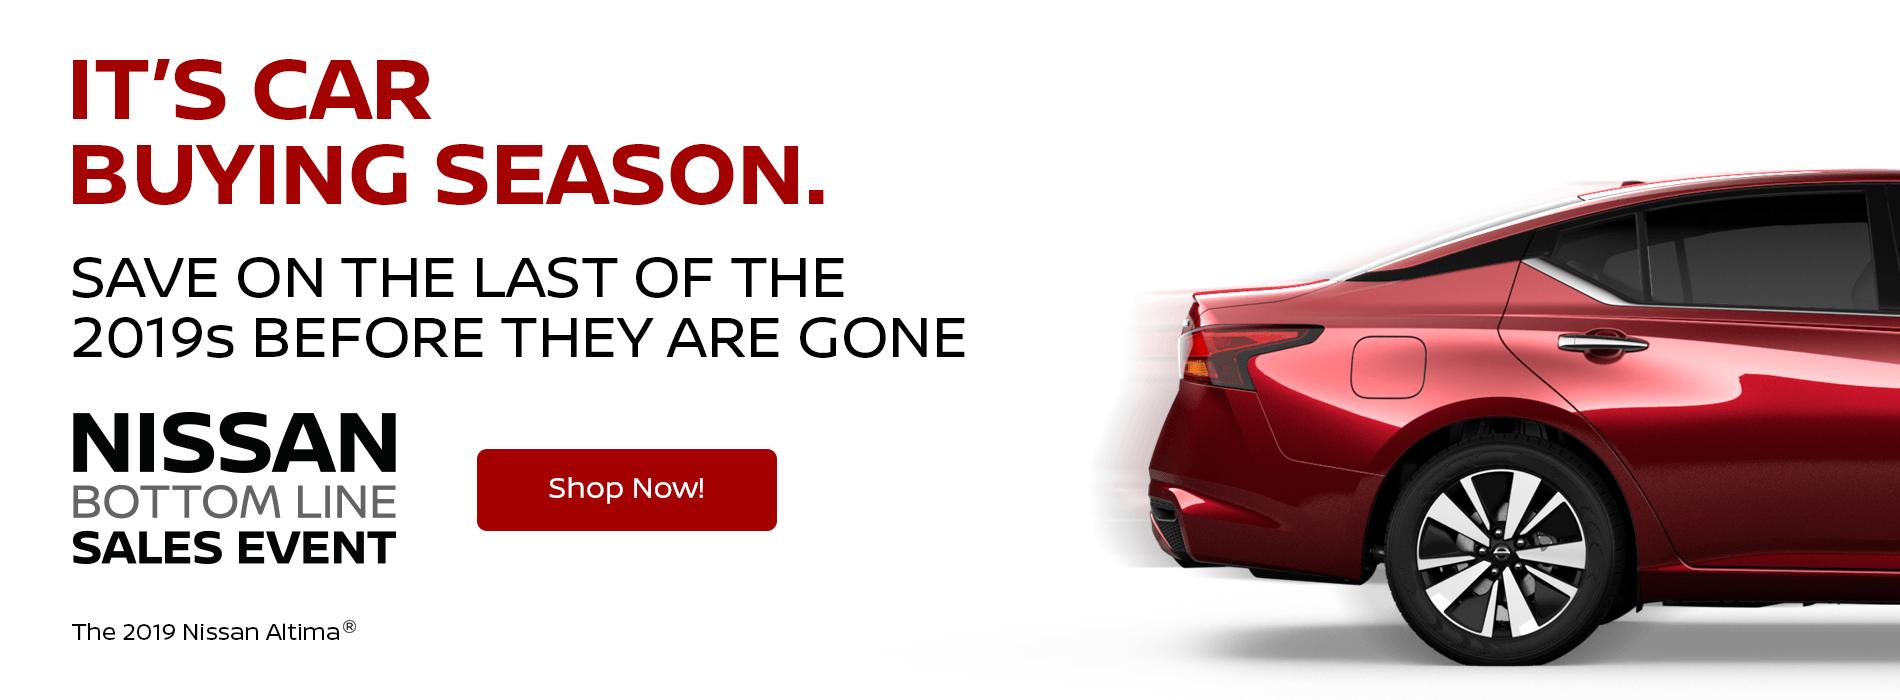 Nissan Bottom Line 2019